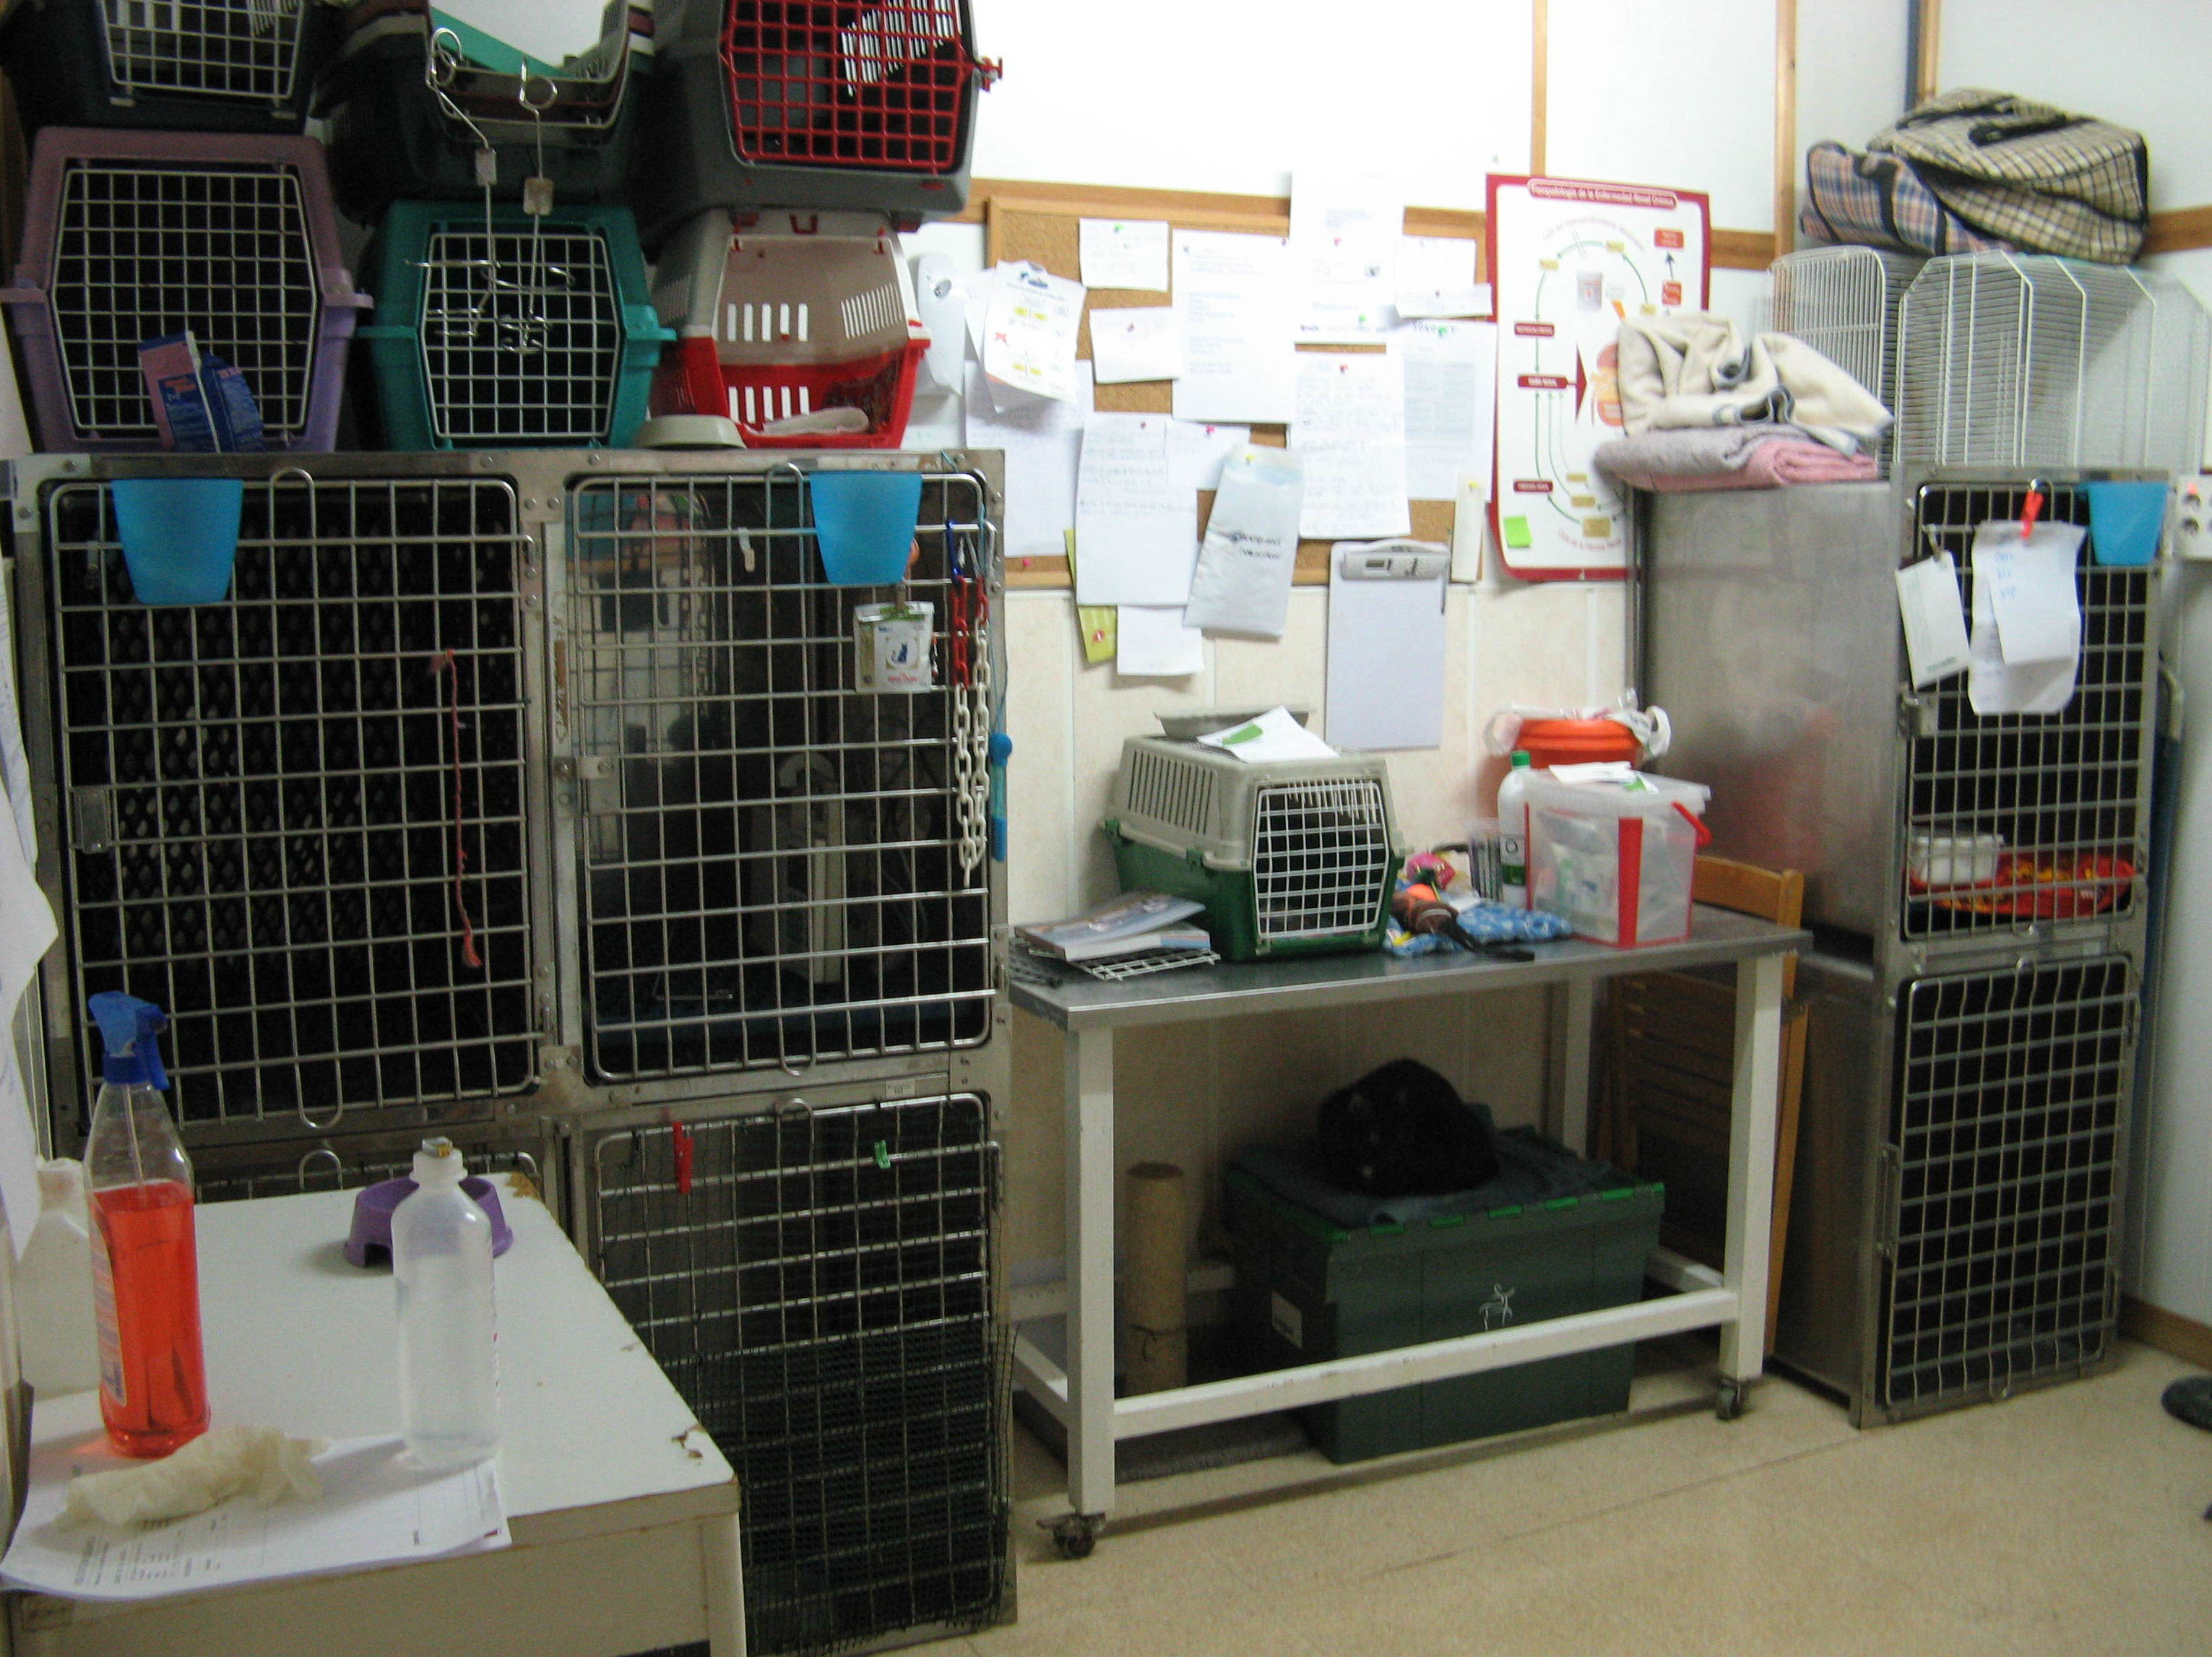 Foto 9 de Clínica veterinaria en Sabadell | Gos i Gat clínica veterinària sl